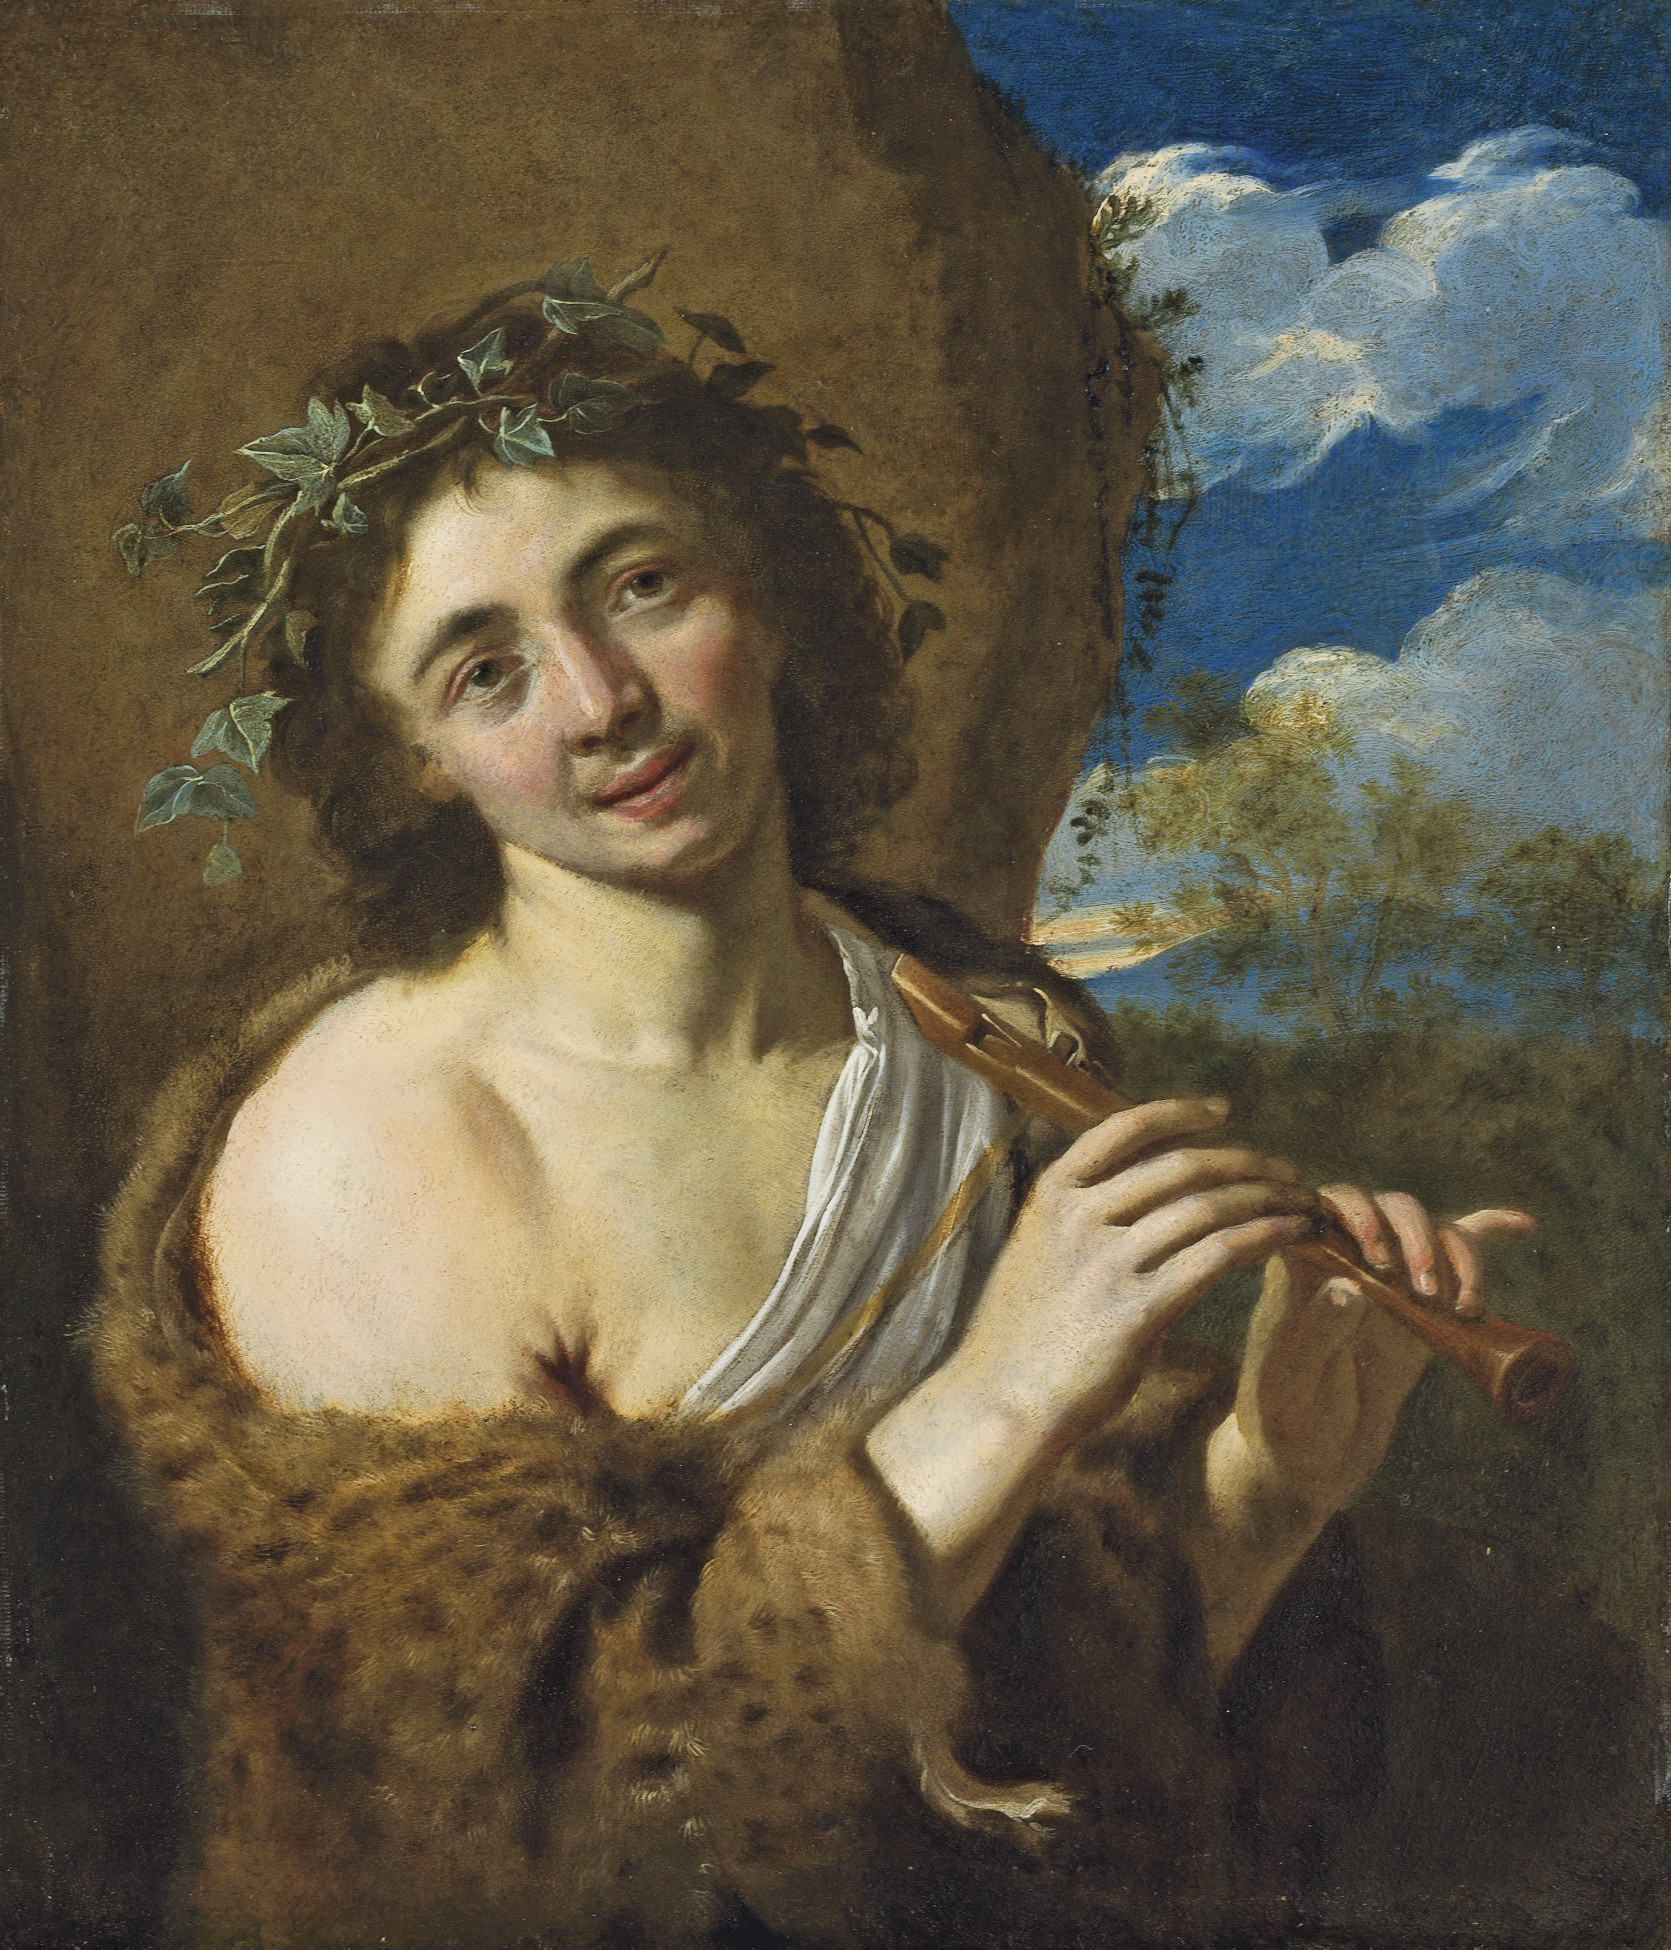 Portrait of a gentleman, said to be the artist Adrian van der Werff, half-length, as Bacchus